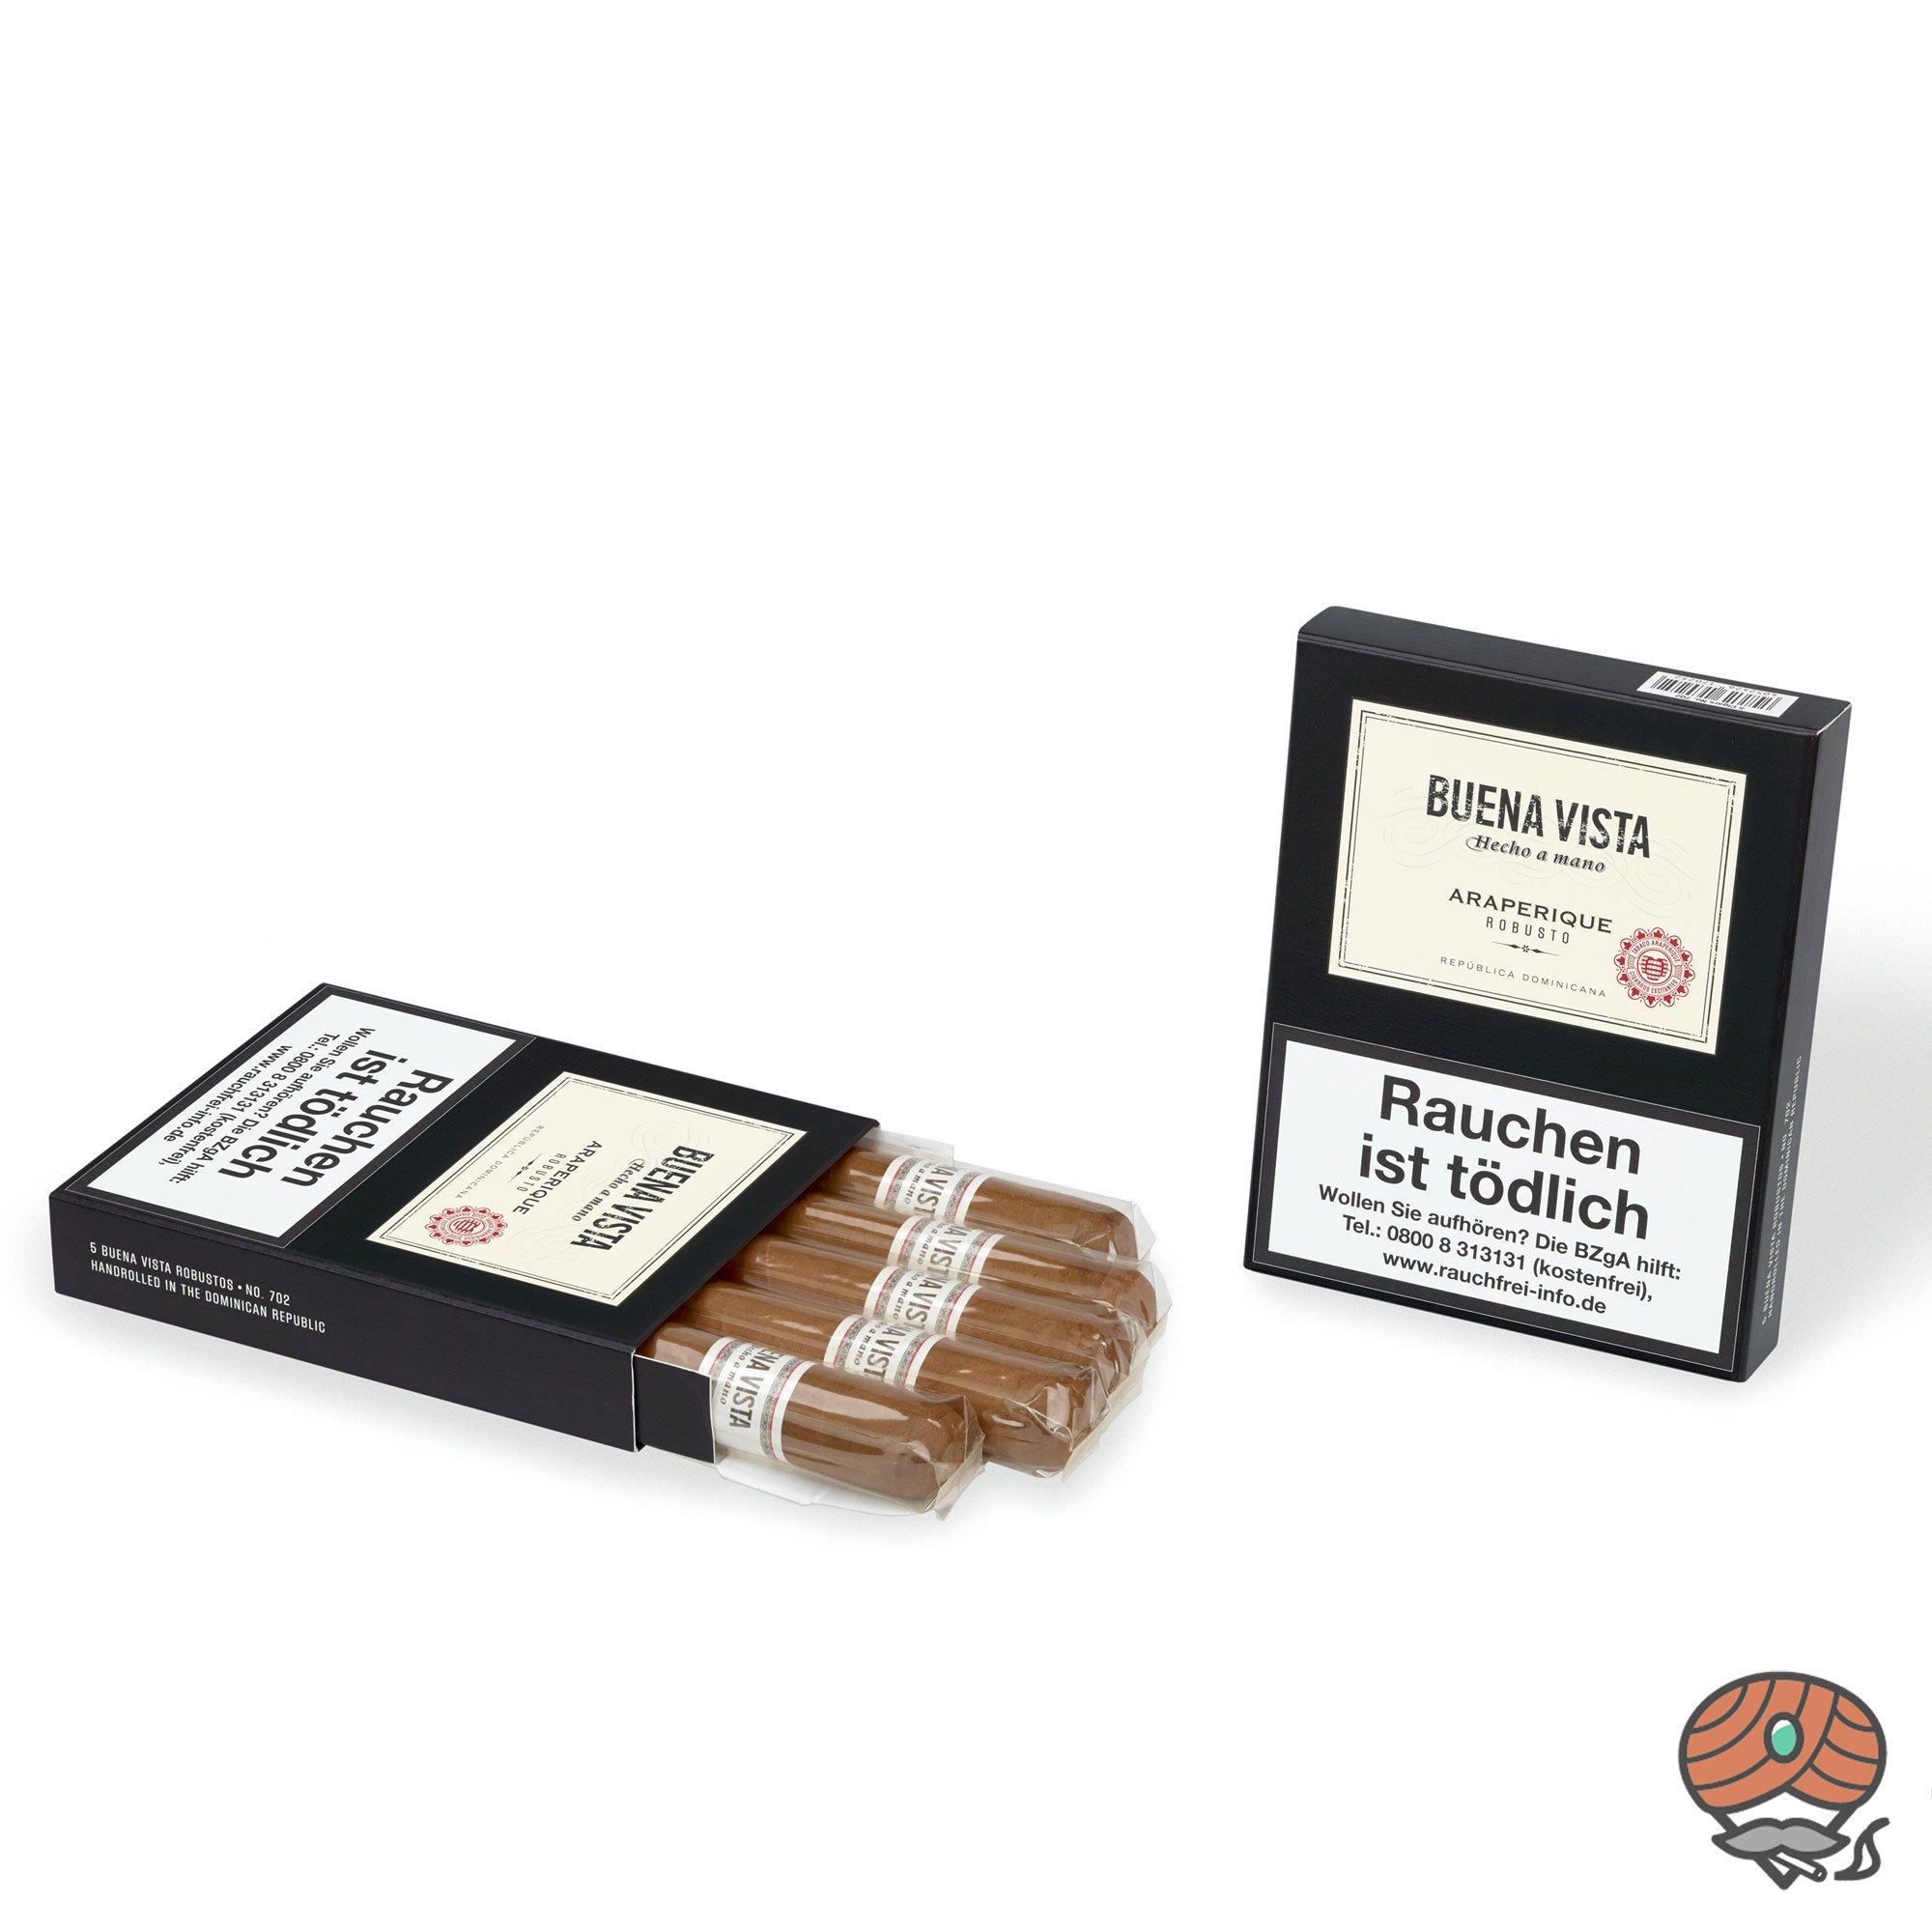 Buena Vista Araperique Robusto Zigarre Dominikanische Republik 5er Pack